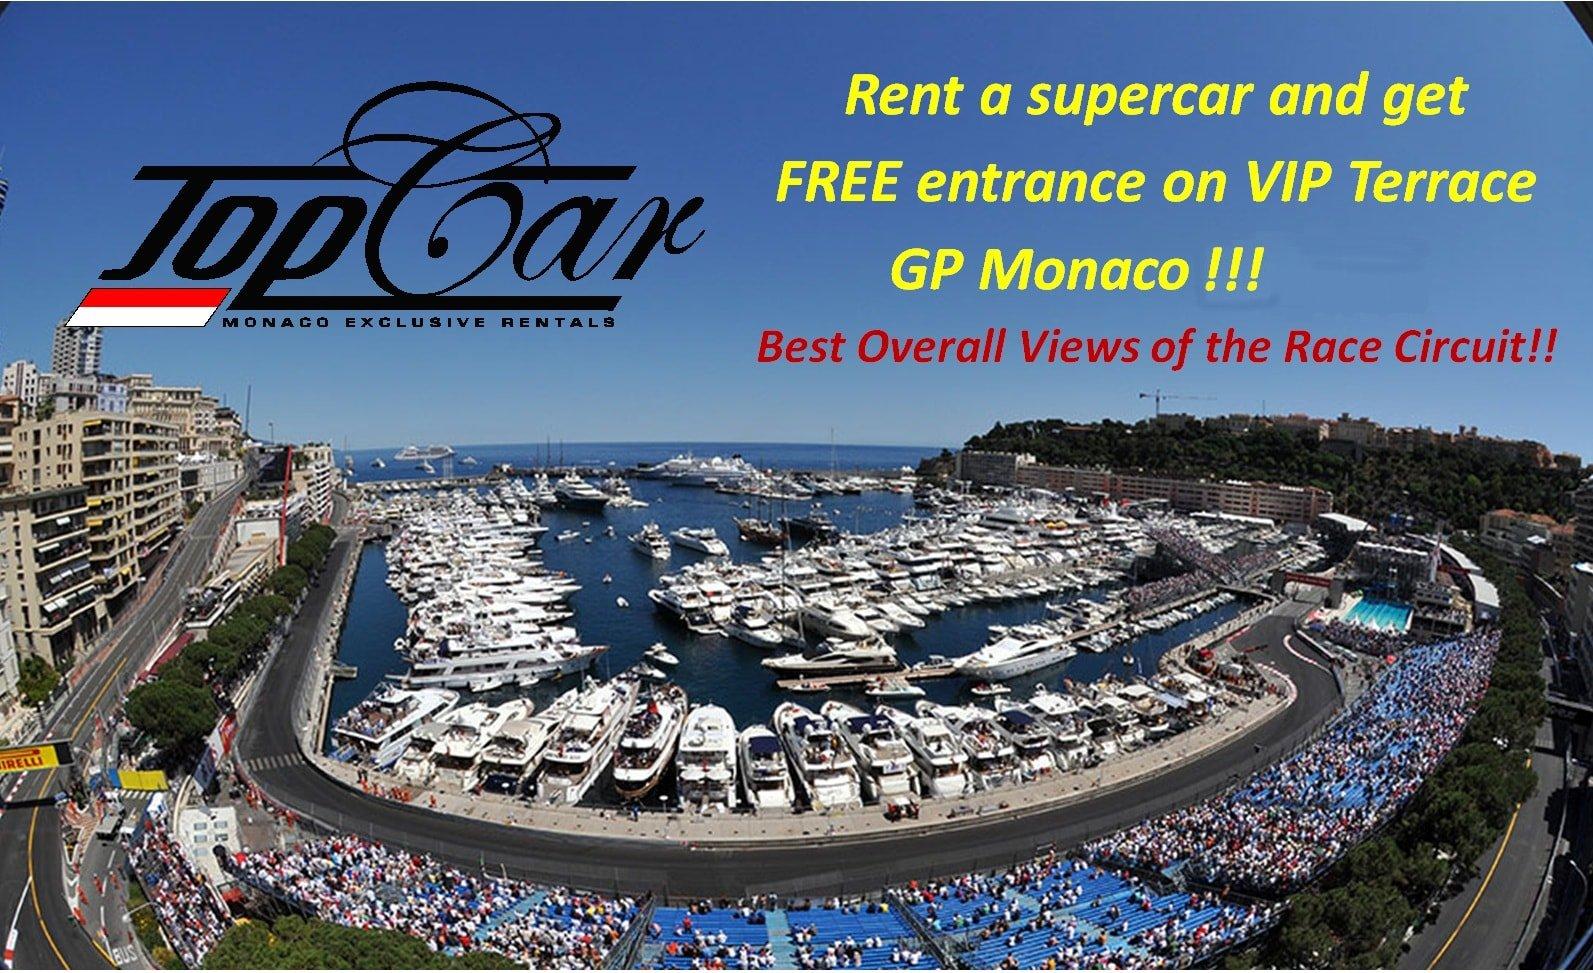 hire rent new car rental sport monaco speciale ferrari aaa luxury